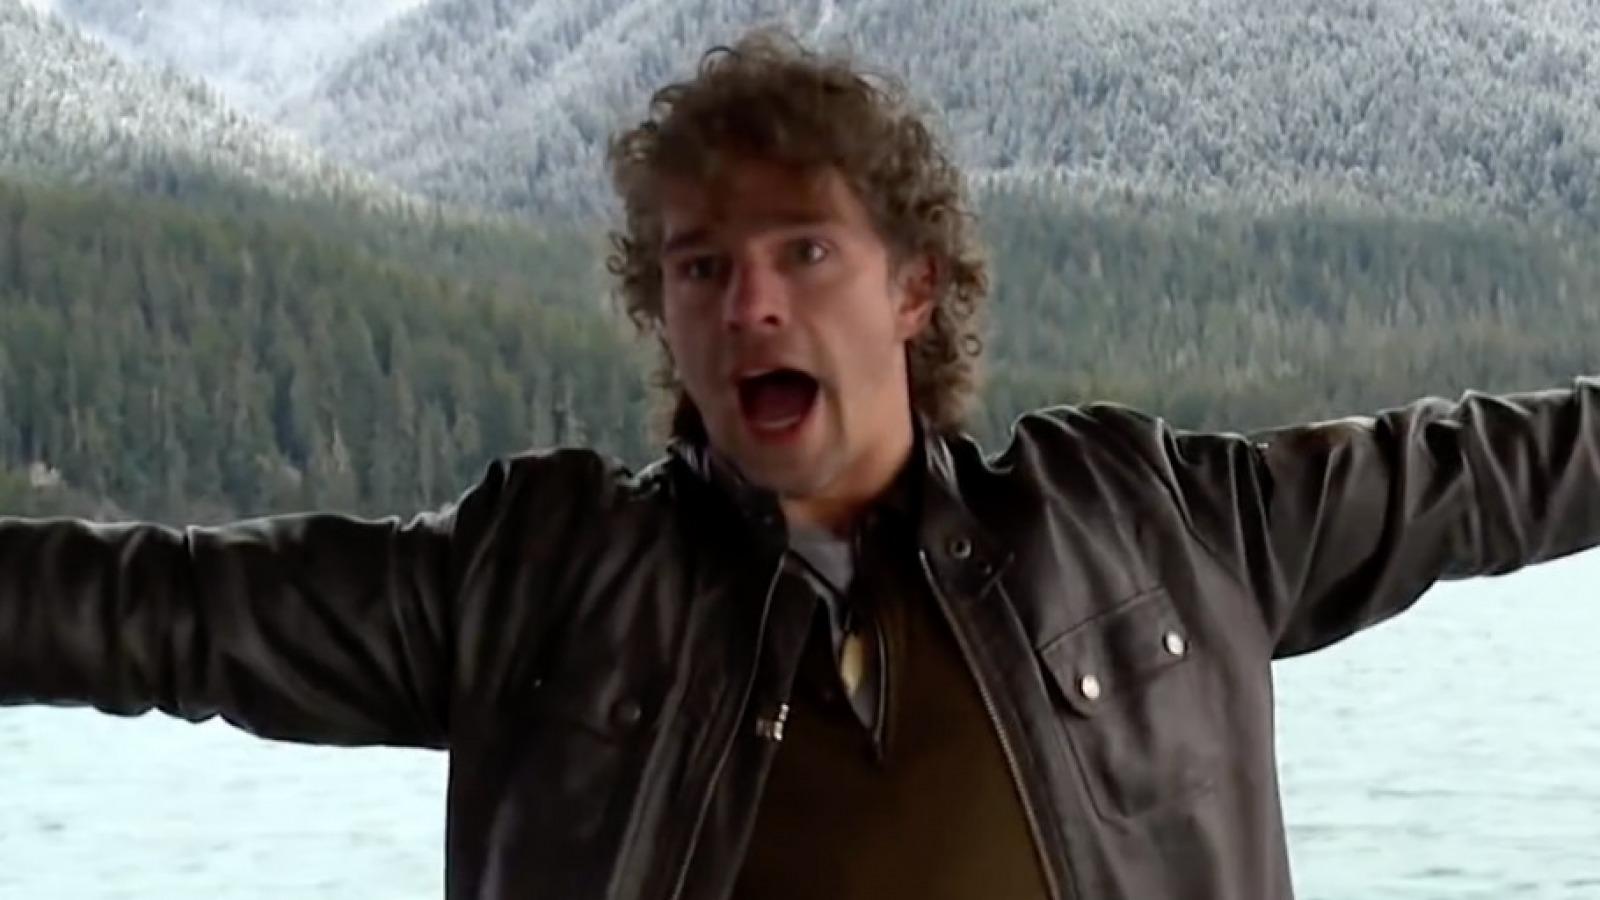 The unsaid truth of Alaskan Bush People star Matt Brown's addiction